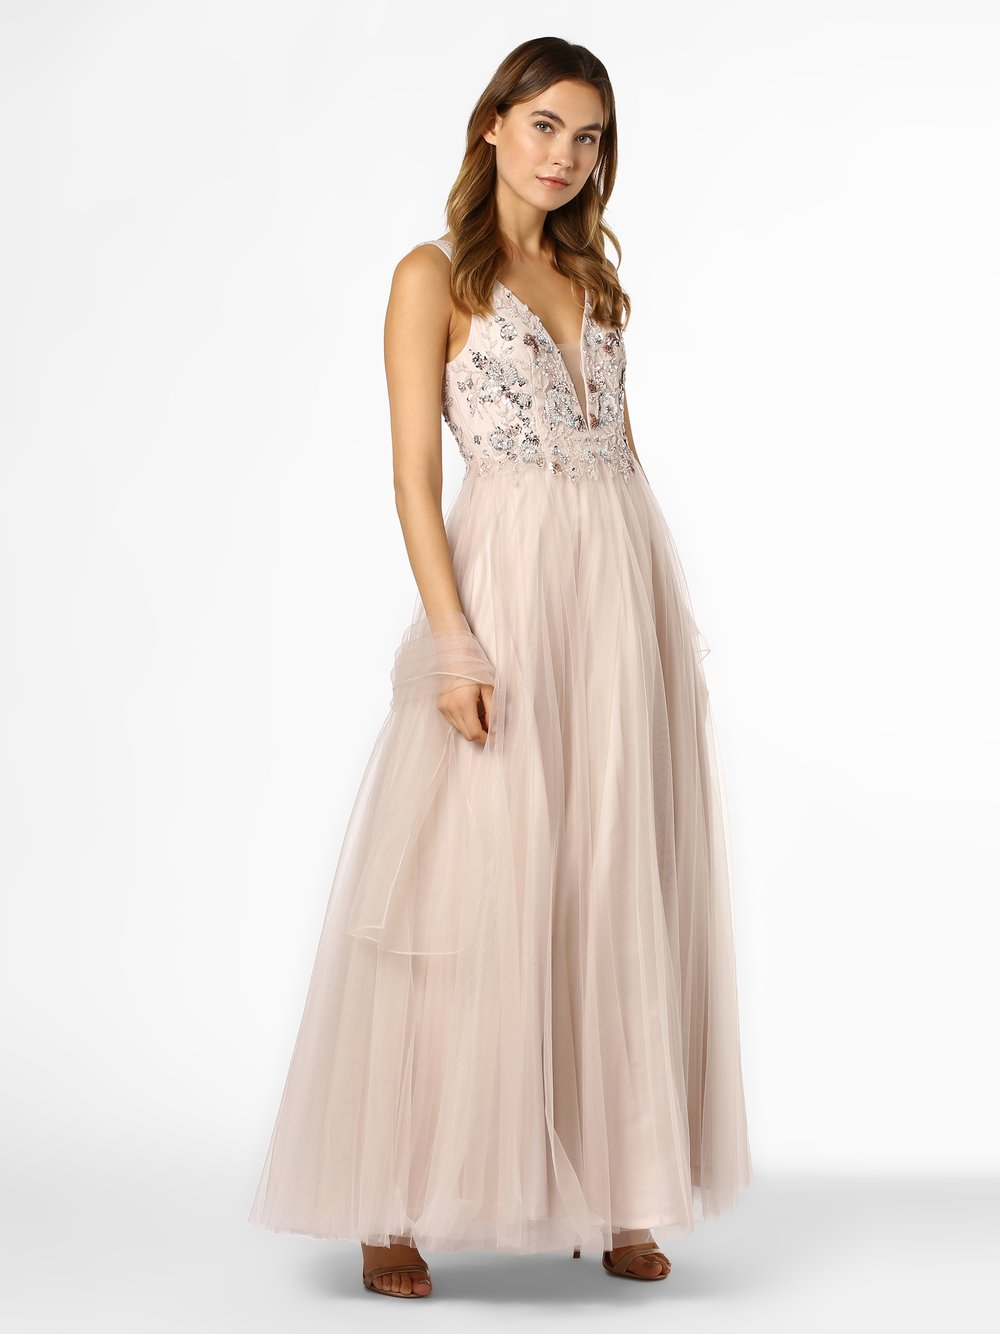 Unique – Damska sukienka wieczorowa, beżowy Van Graaf 456329-0001-00400